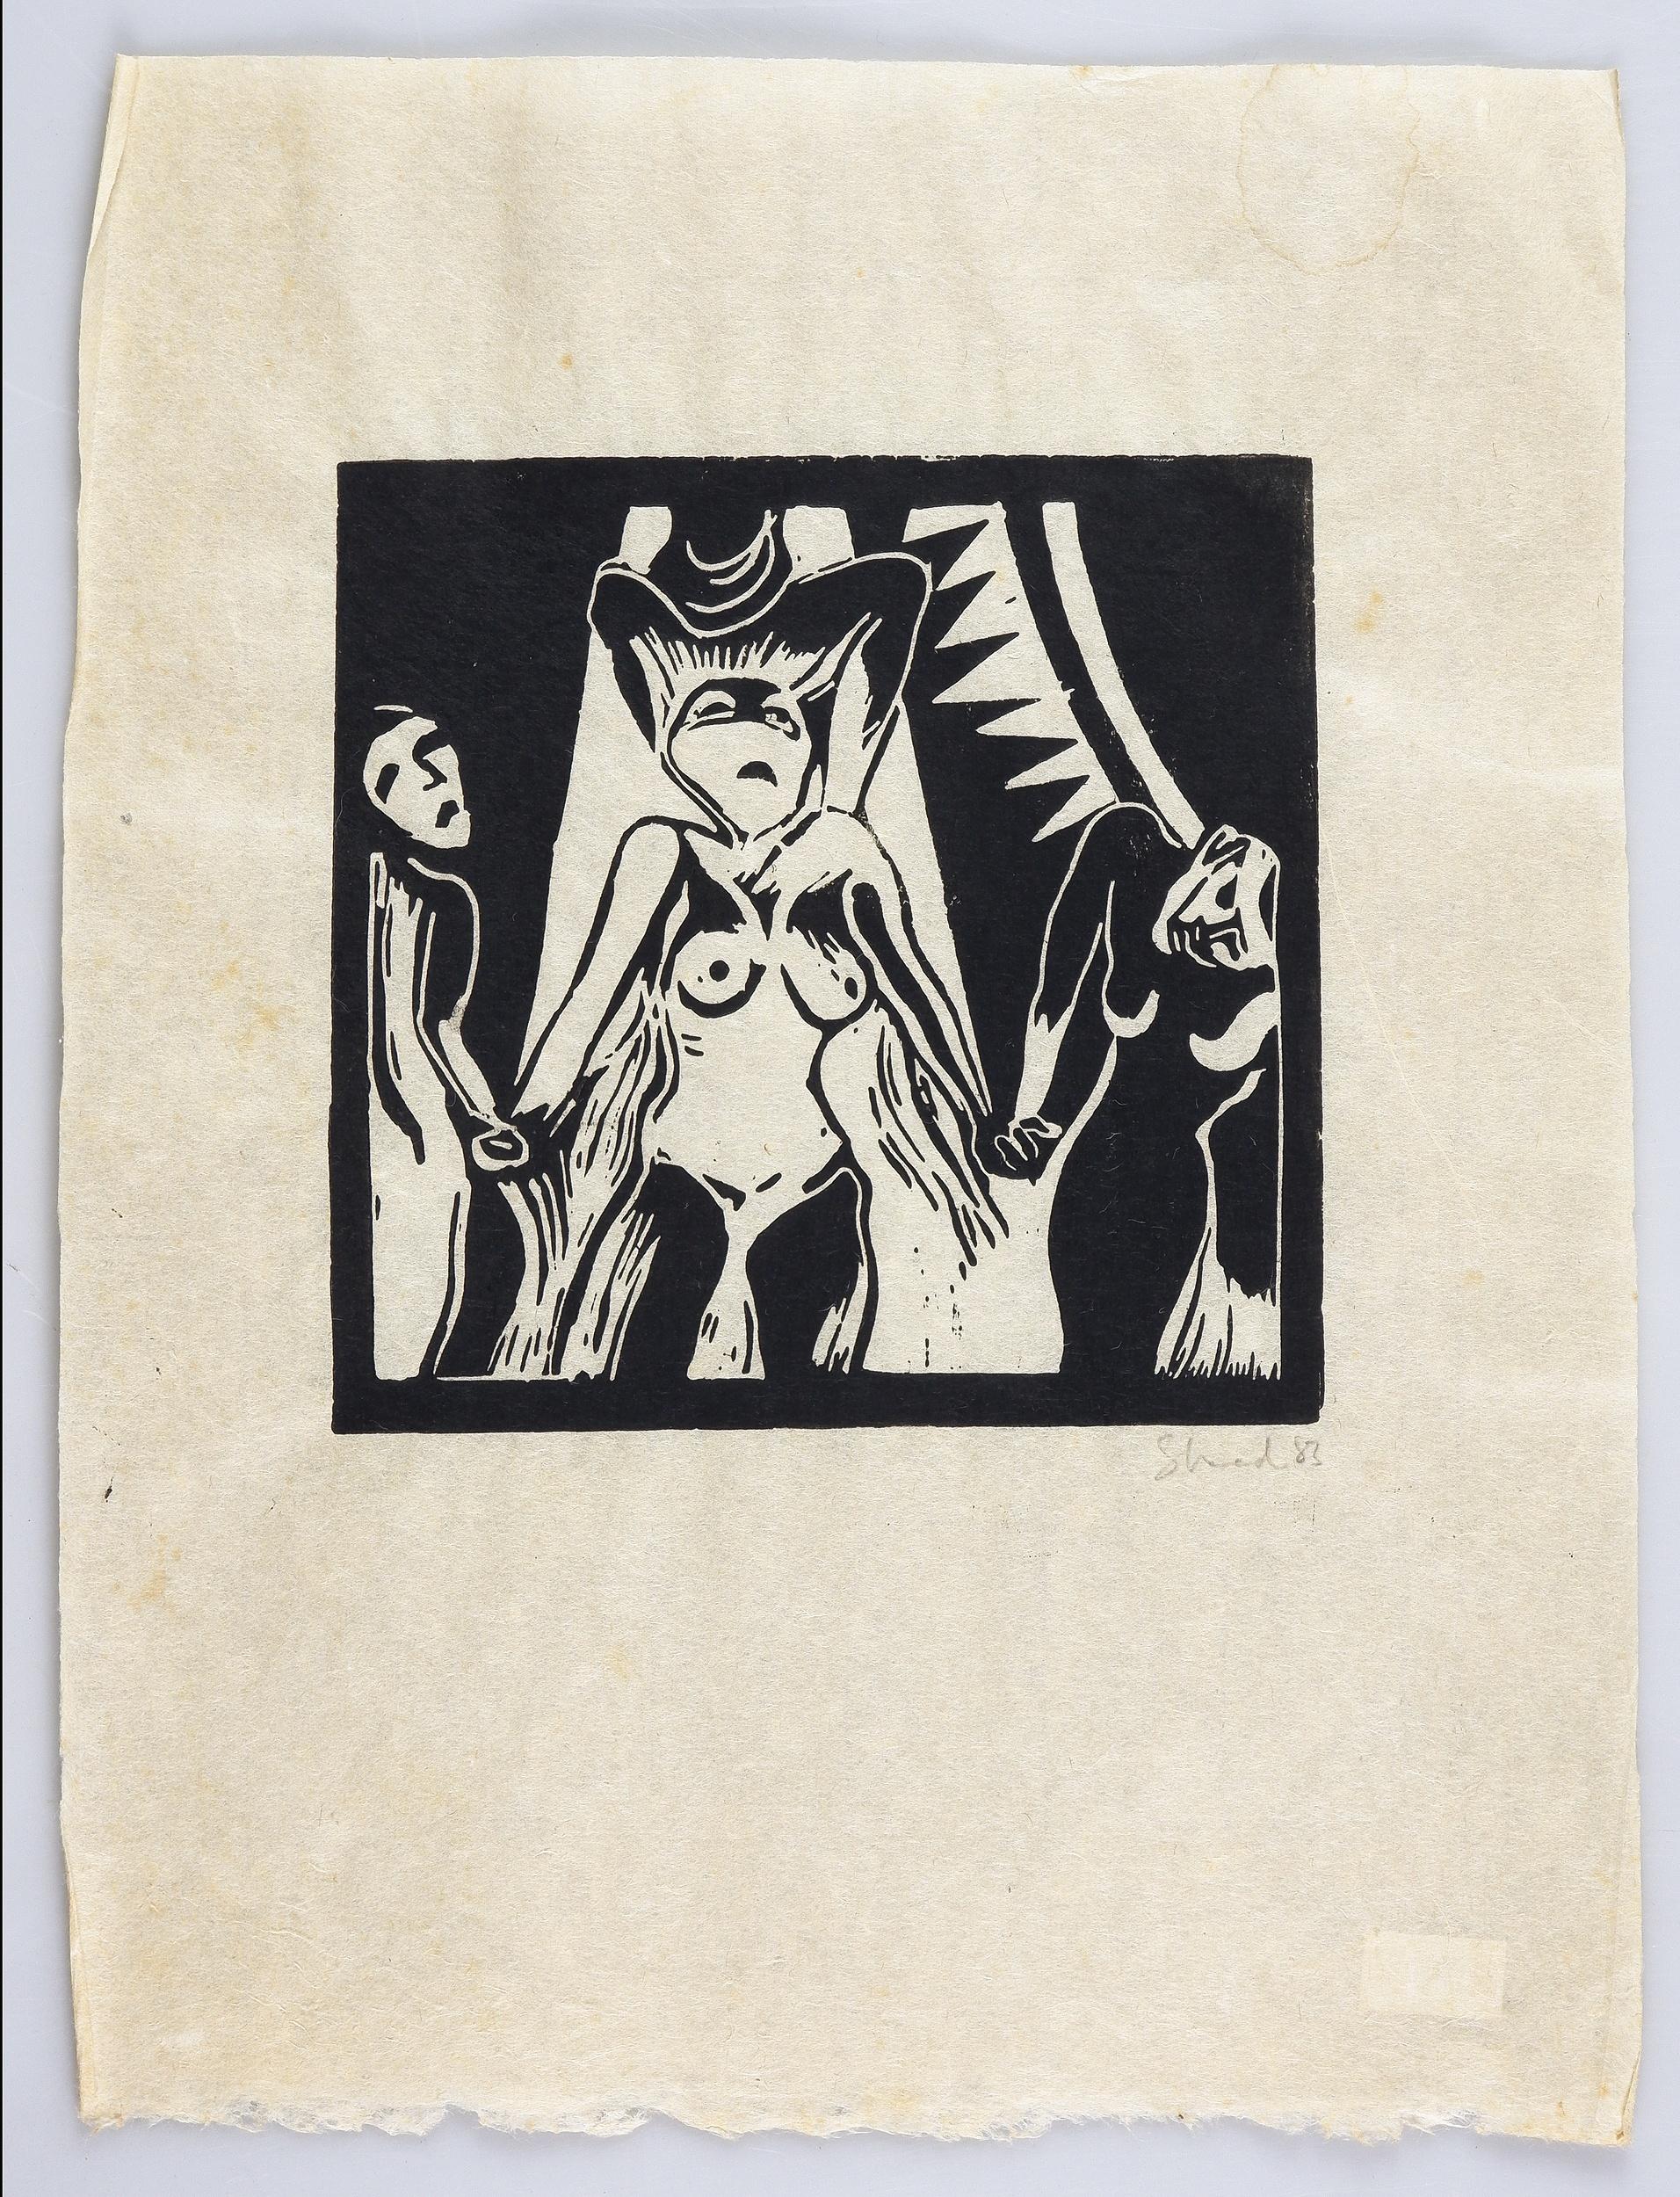 'Garry Shead (born 1942), The Circus Series 1983 (5), Linocut'